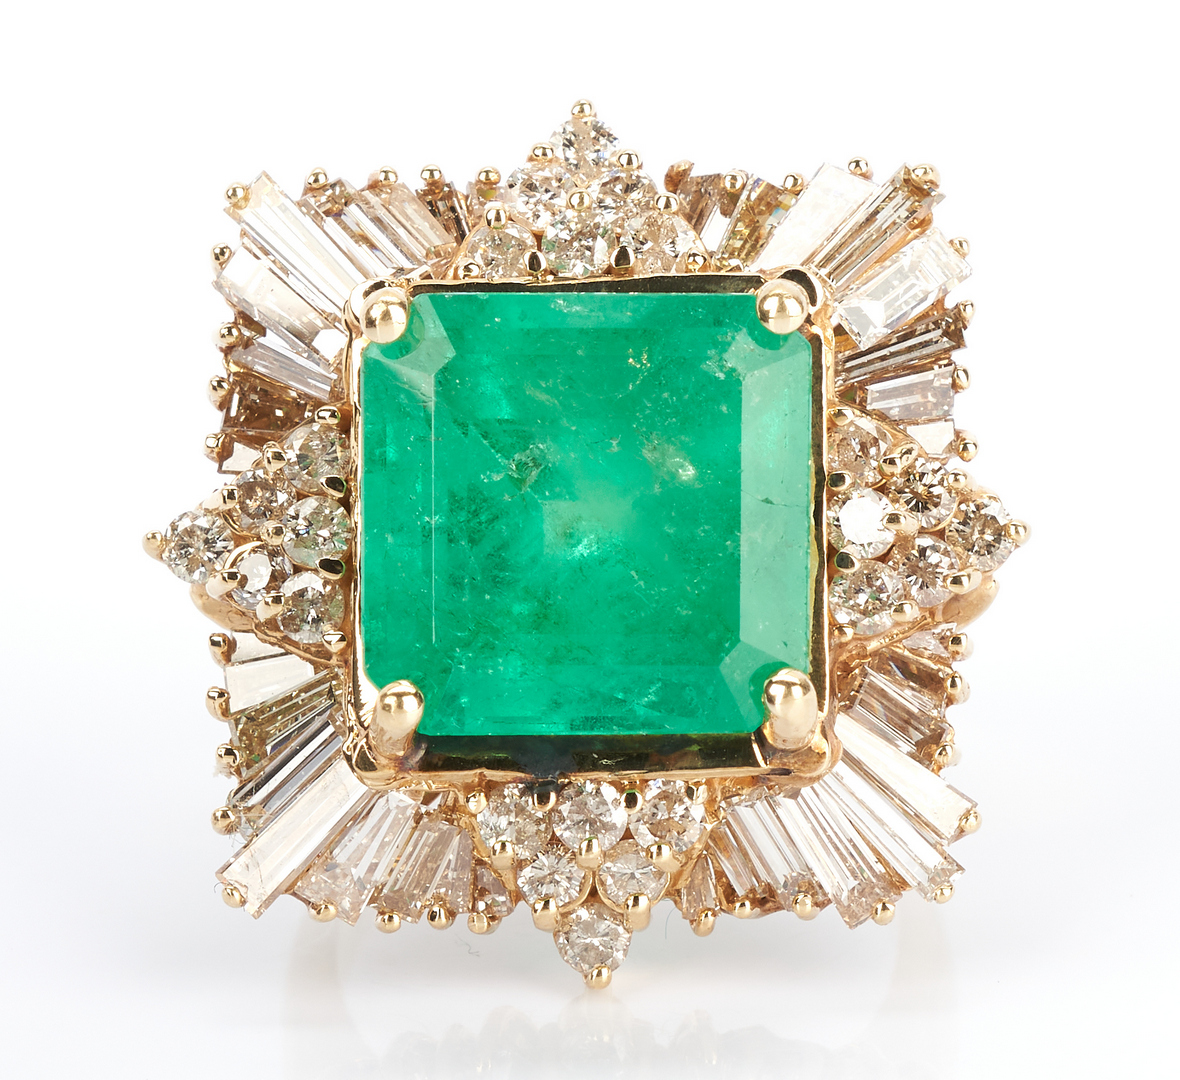 Lot 213: Ladies 14K Square Cut Emerald & Diamond Ring, 13.82 Cts.